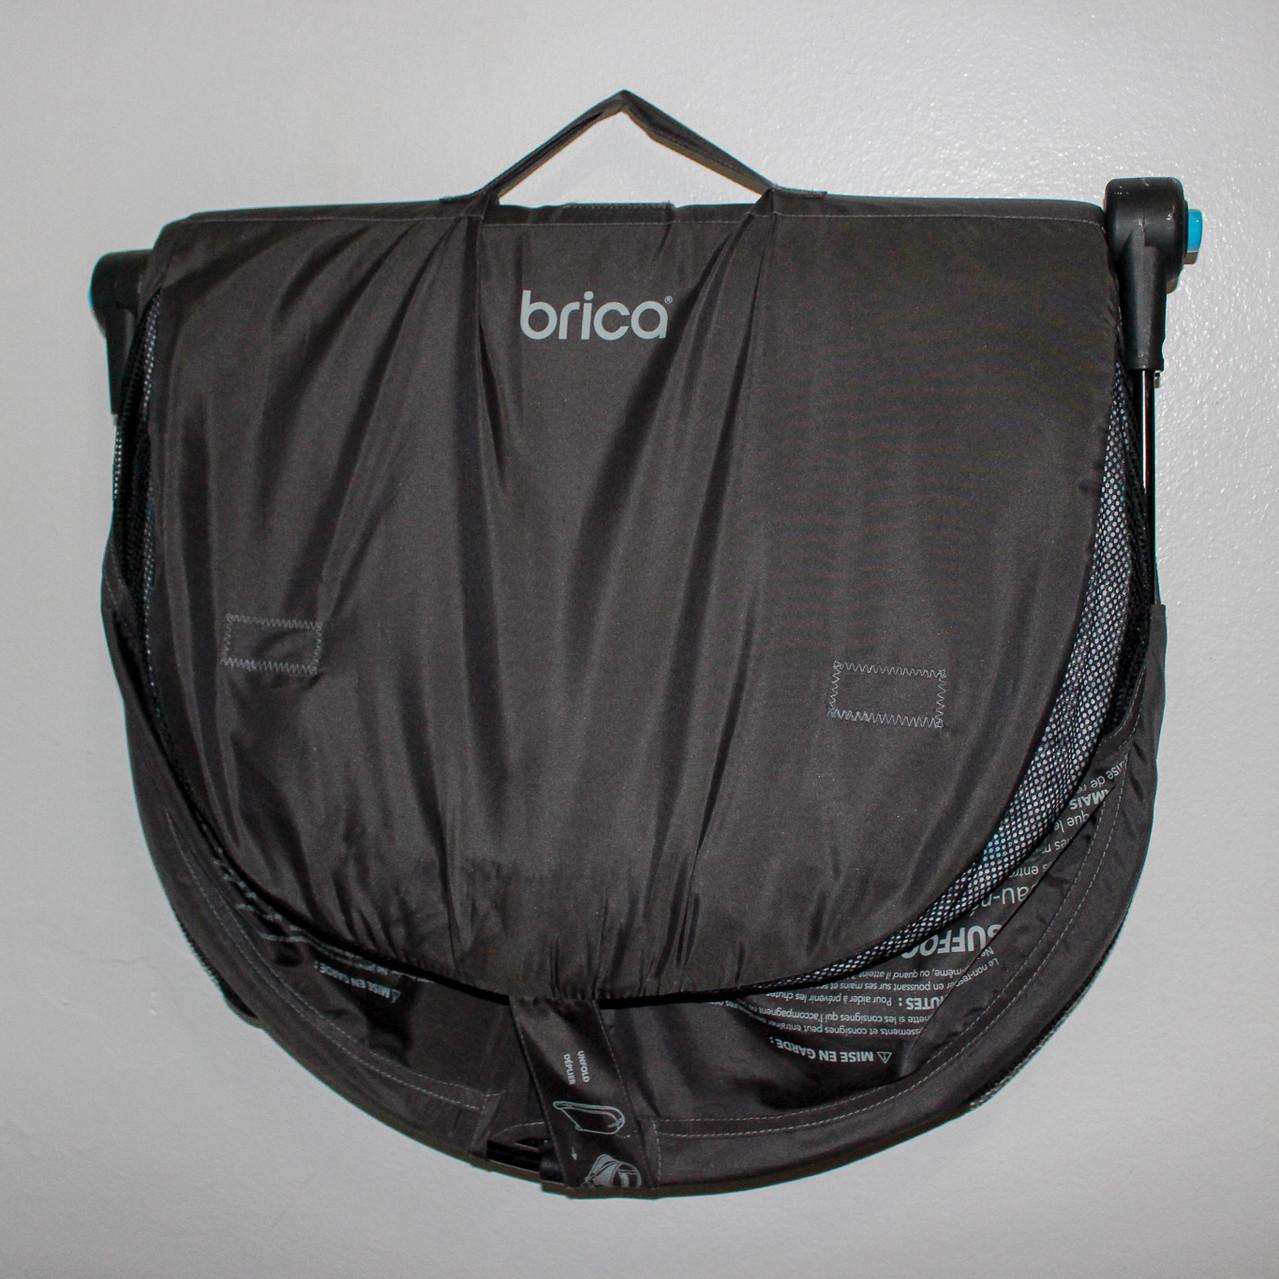 Travel Bassinet Folded ready to Go